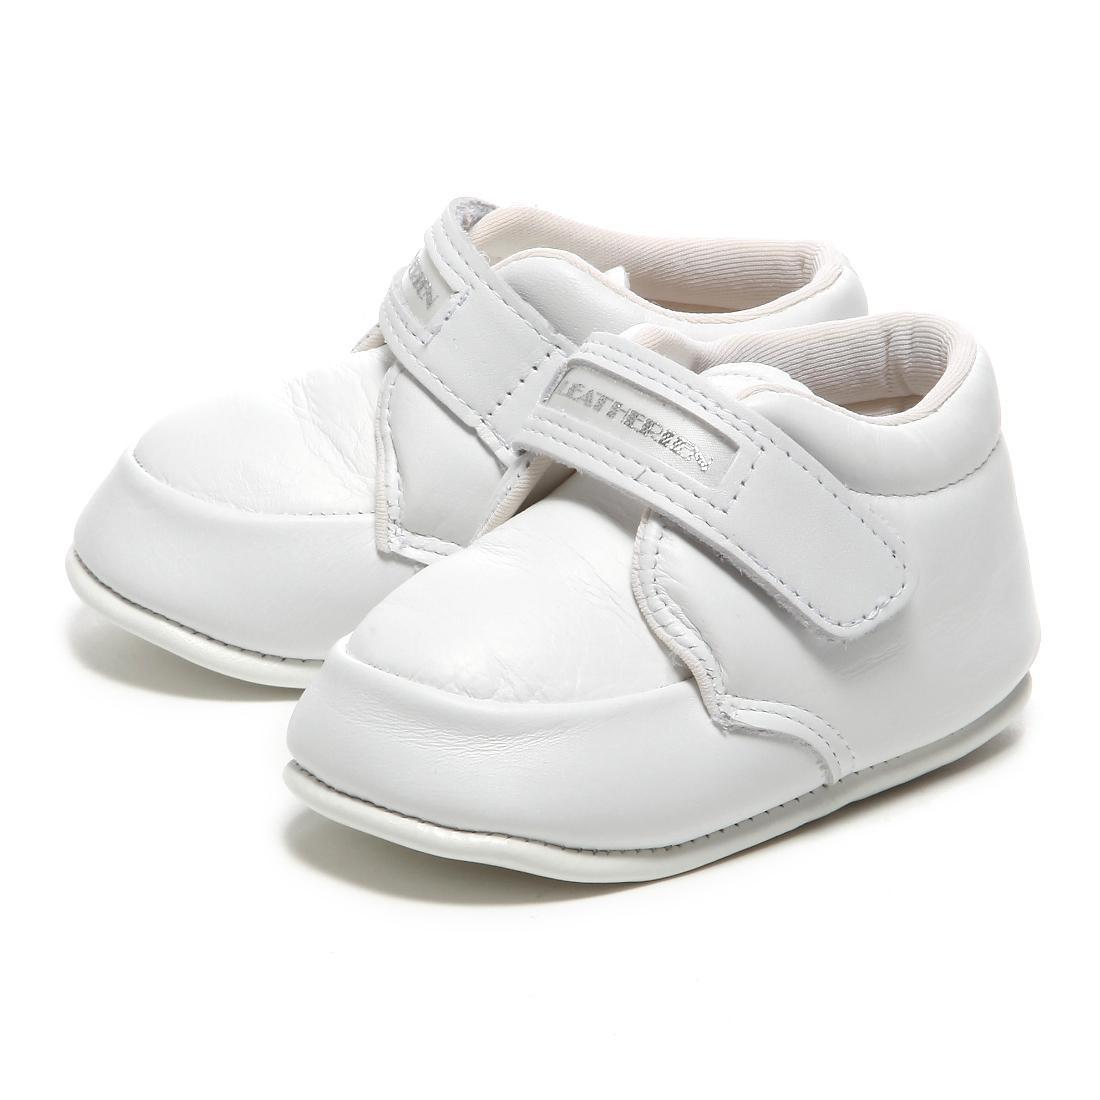 LEATHERIAN FIRST SHOES COMBI (первые шаги) белые